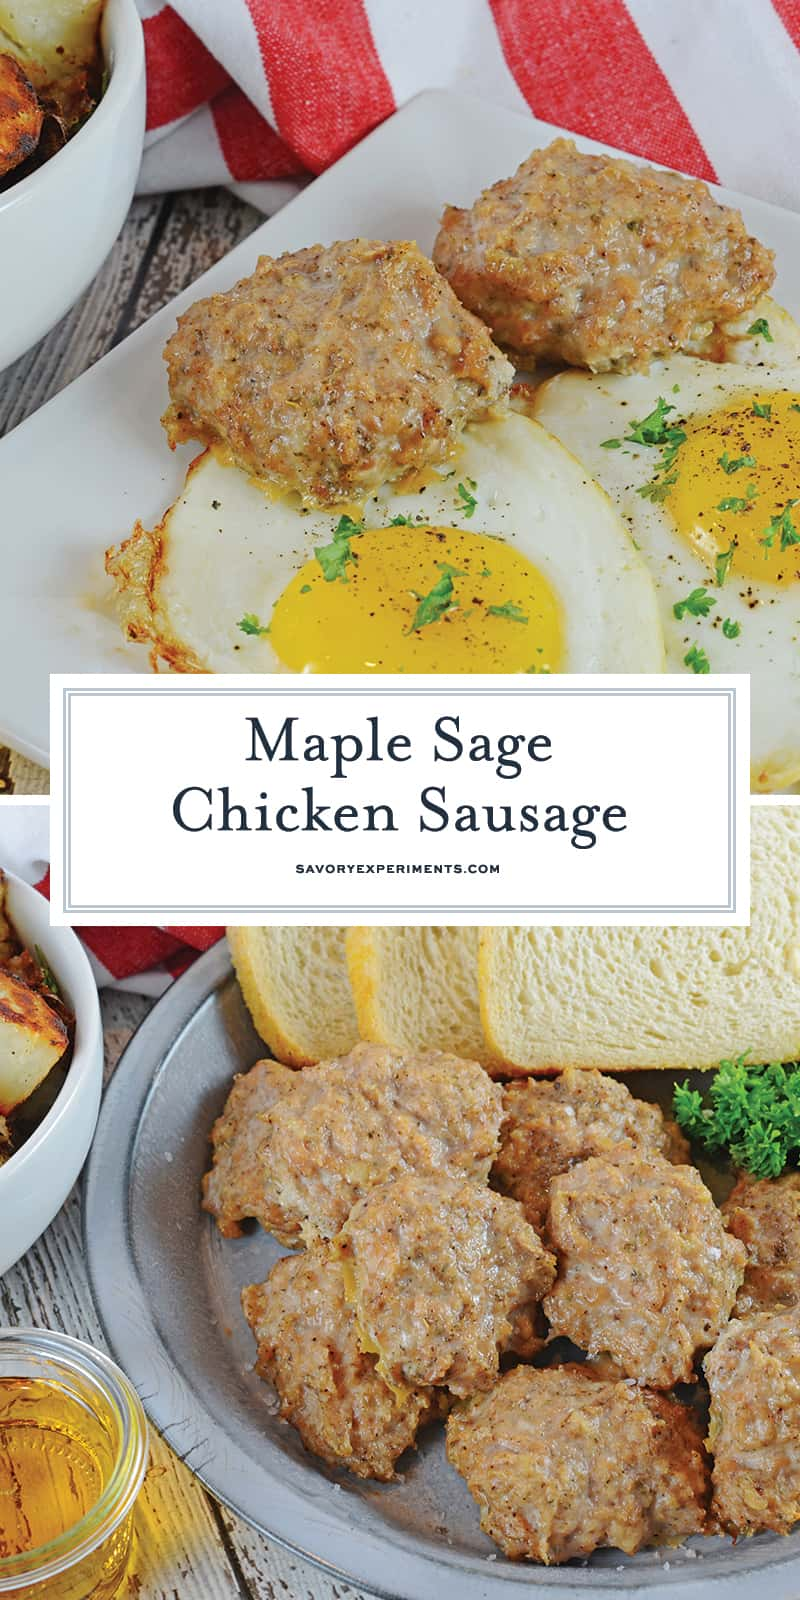 Maple Sage Chicken Sausage | Savory Experiments